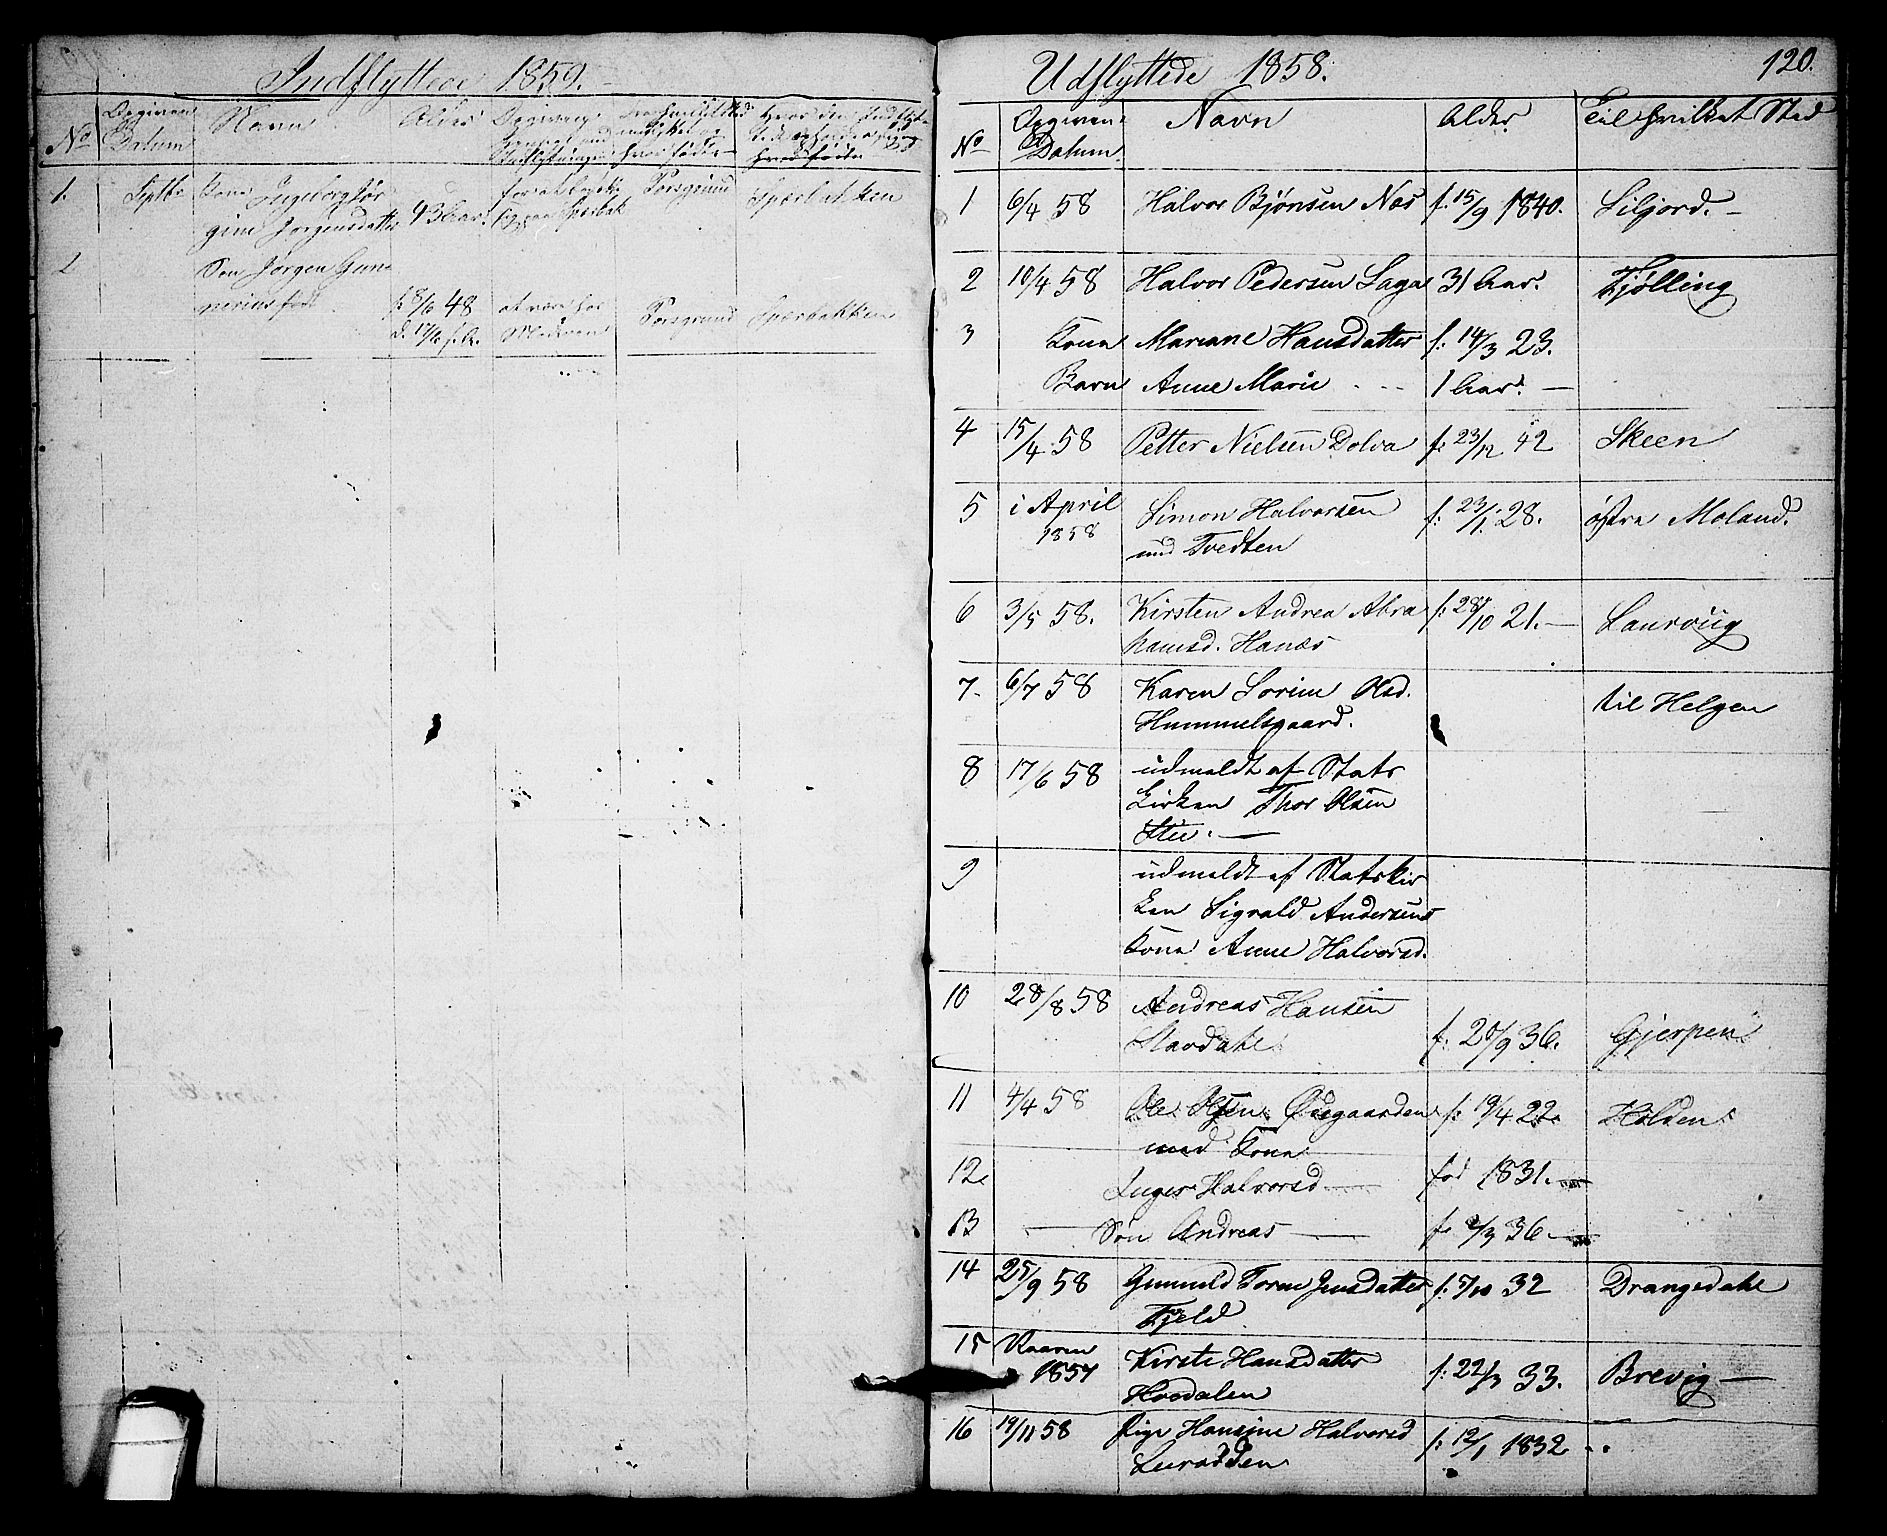 SAKO, Solum kirkebøker, G/Gb/L0001: Klokkerbok nr. II 1, 1848-1859, s. 120